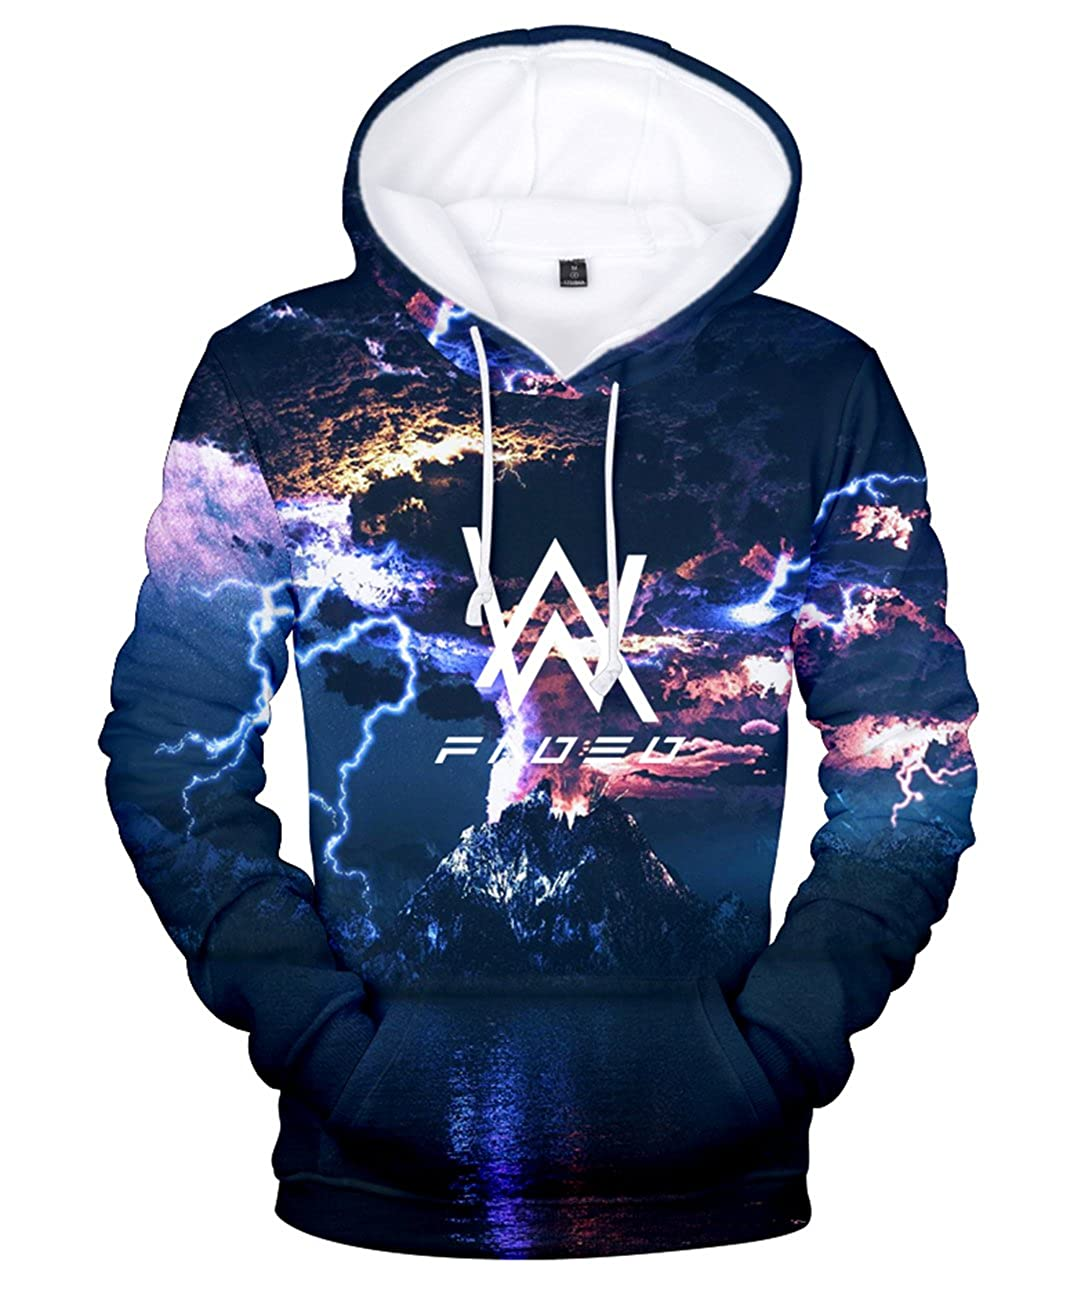 ZIGJOY Alan Olav Walker 3D Printed Sweatshirt Fashion Music Hoodie Men Women at Amazon Womens Clothing store: